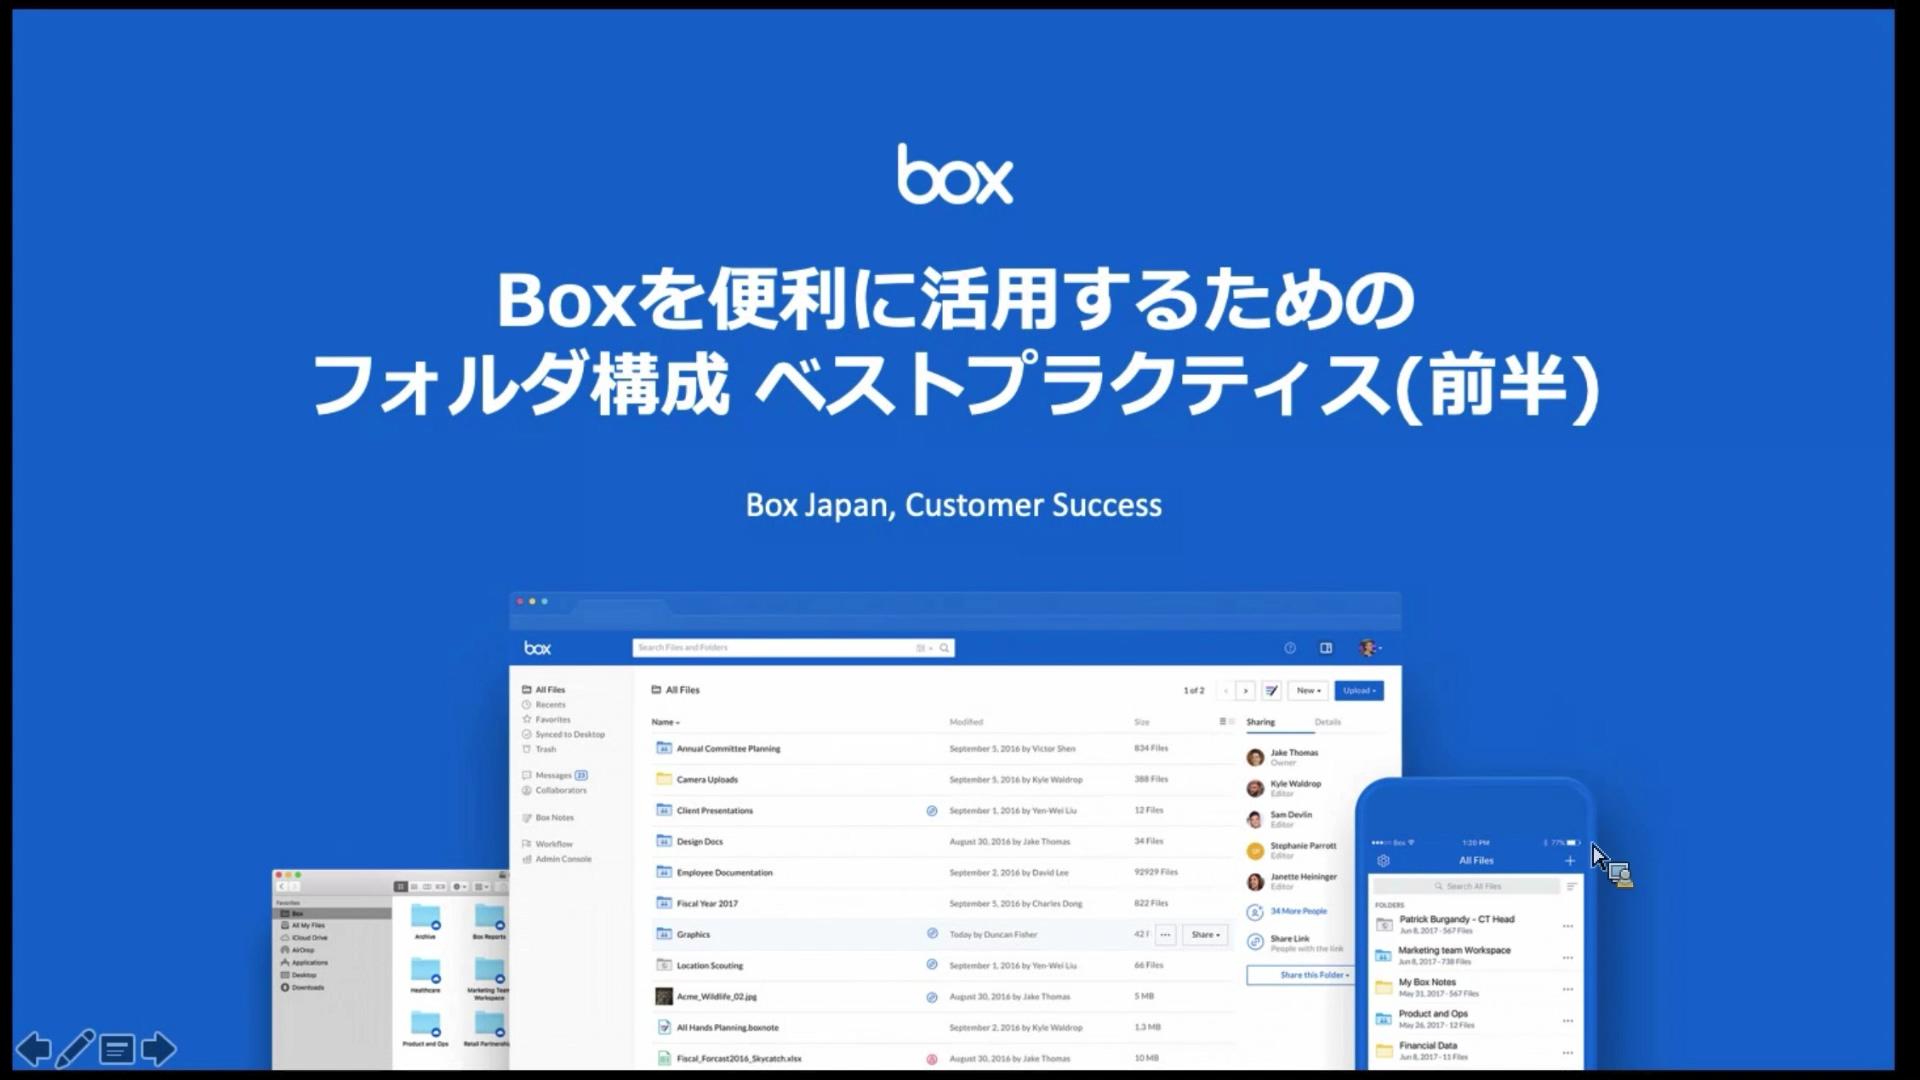 box-online-seminar-20190705